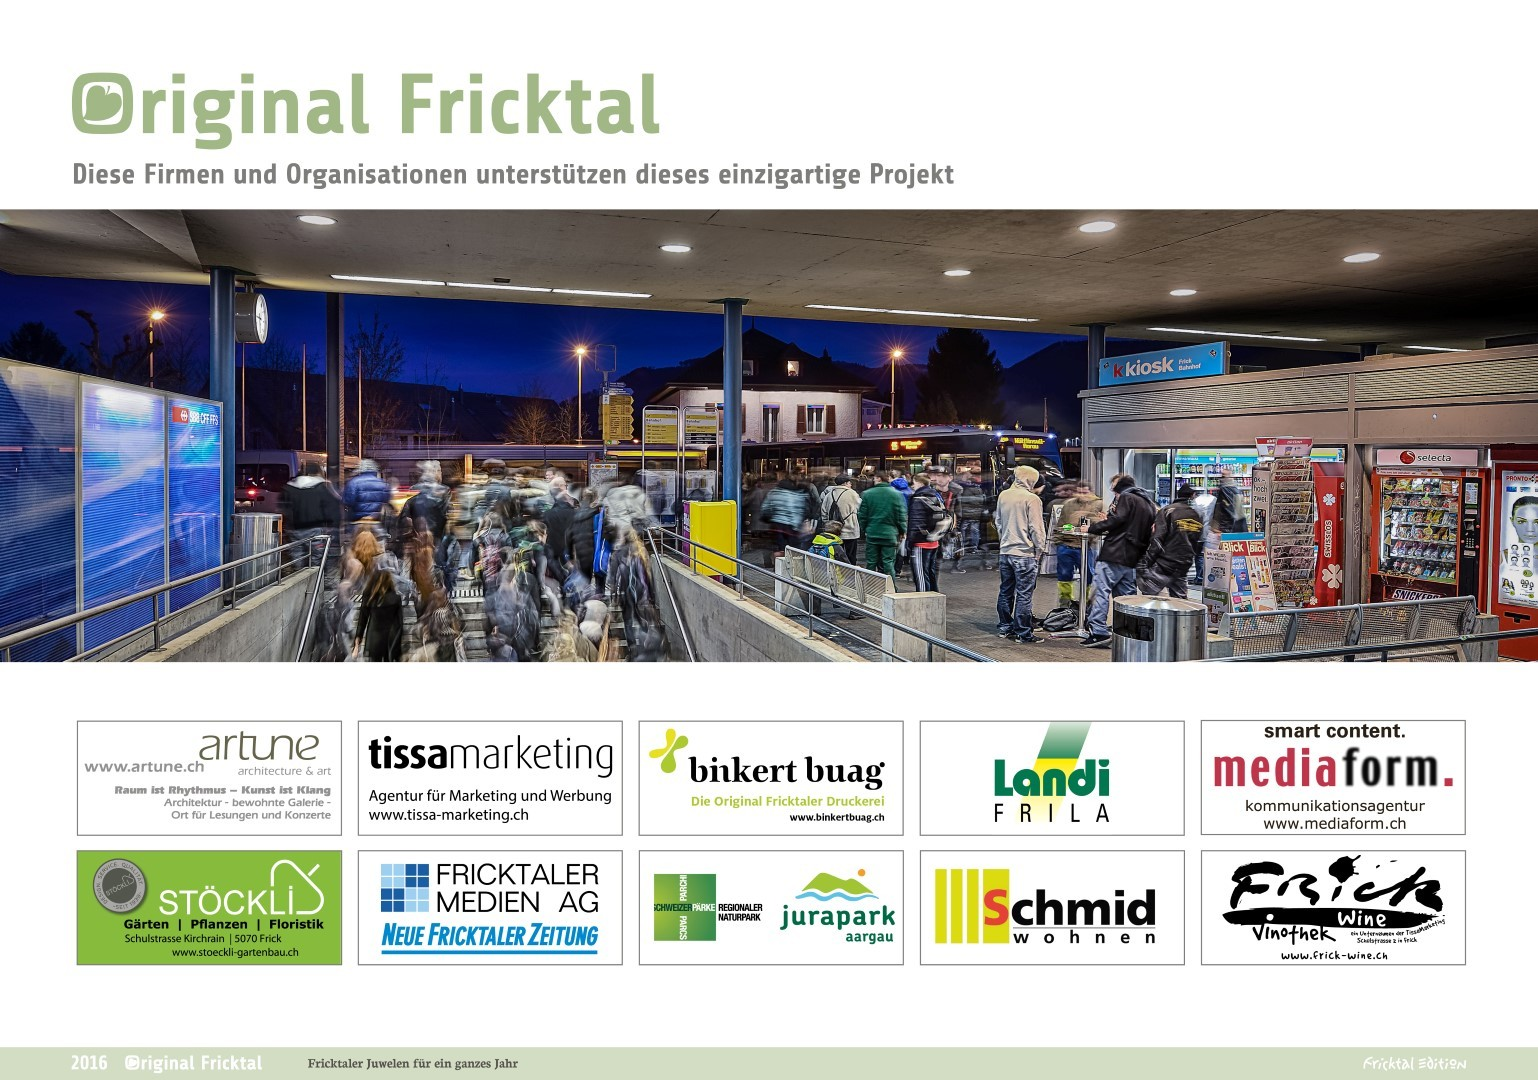 Original Fricktal, Sponsoren